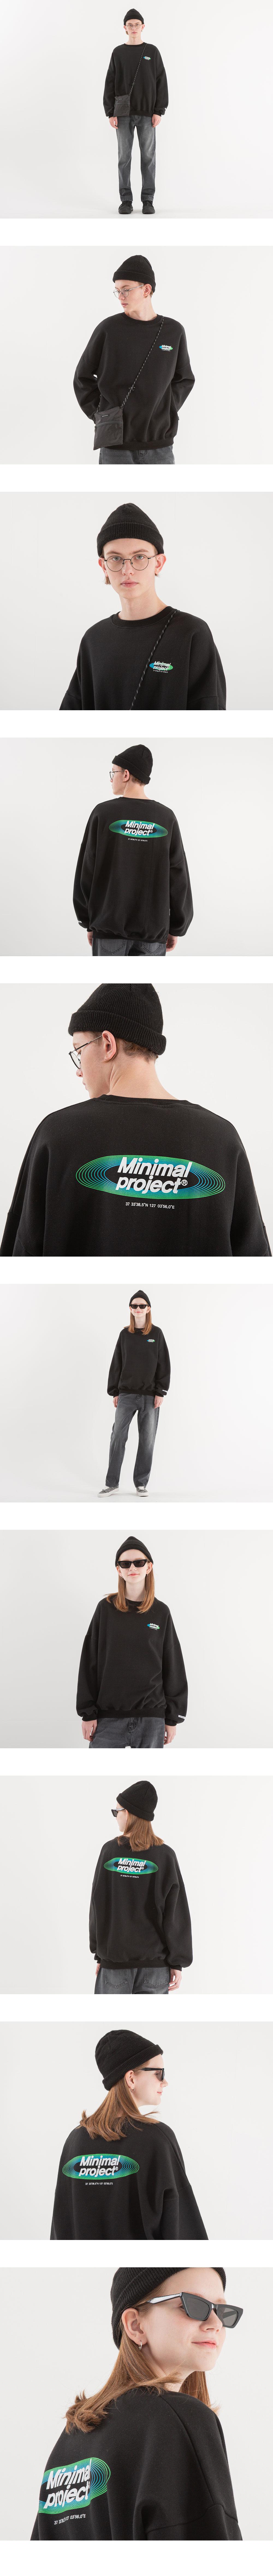 [minimal project] 미니멀프로젝트 오벌 그라데이션 오버핏 맨투맨 MMT105 [BLACK]